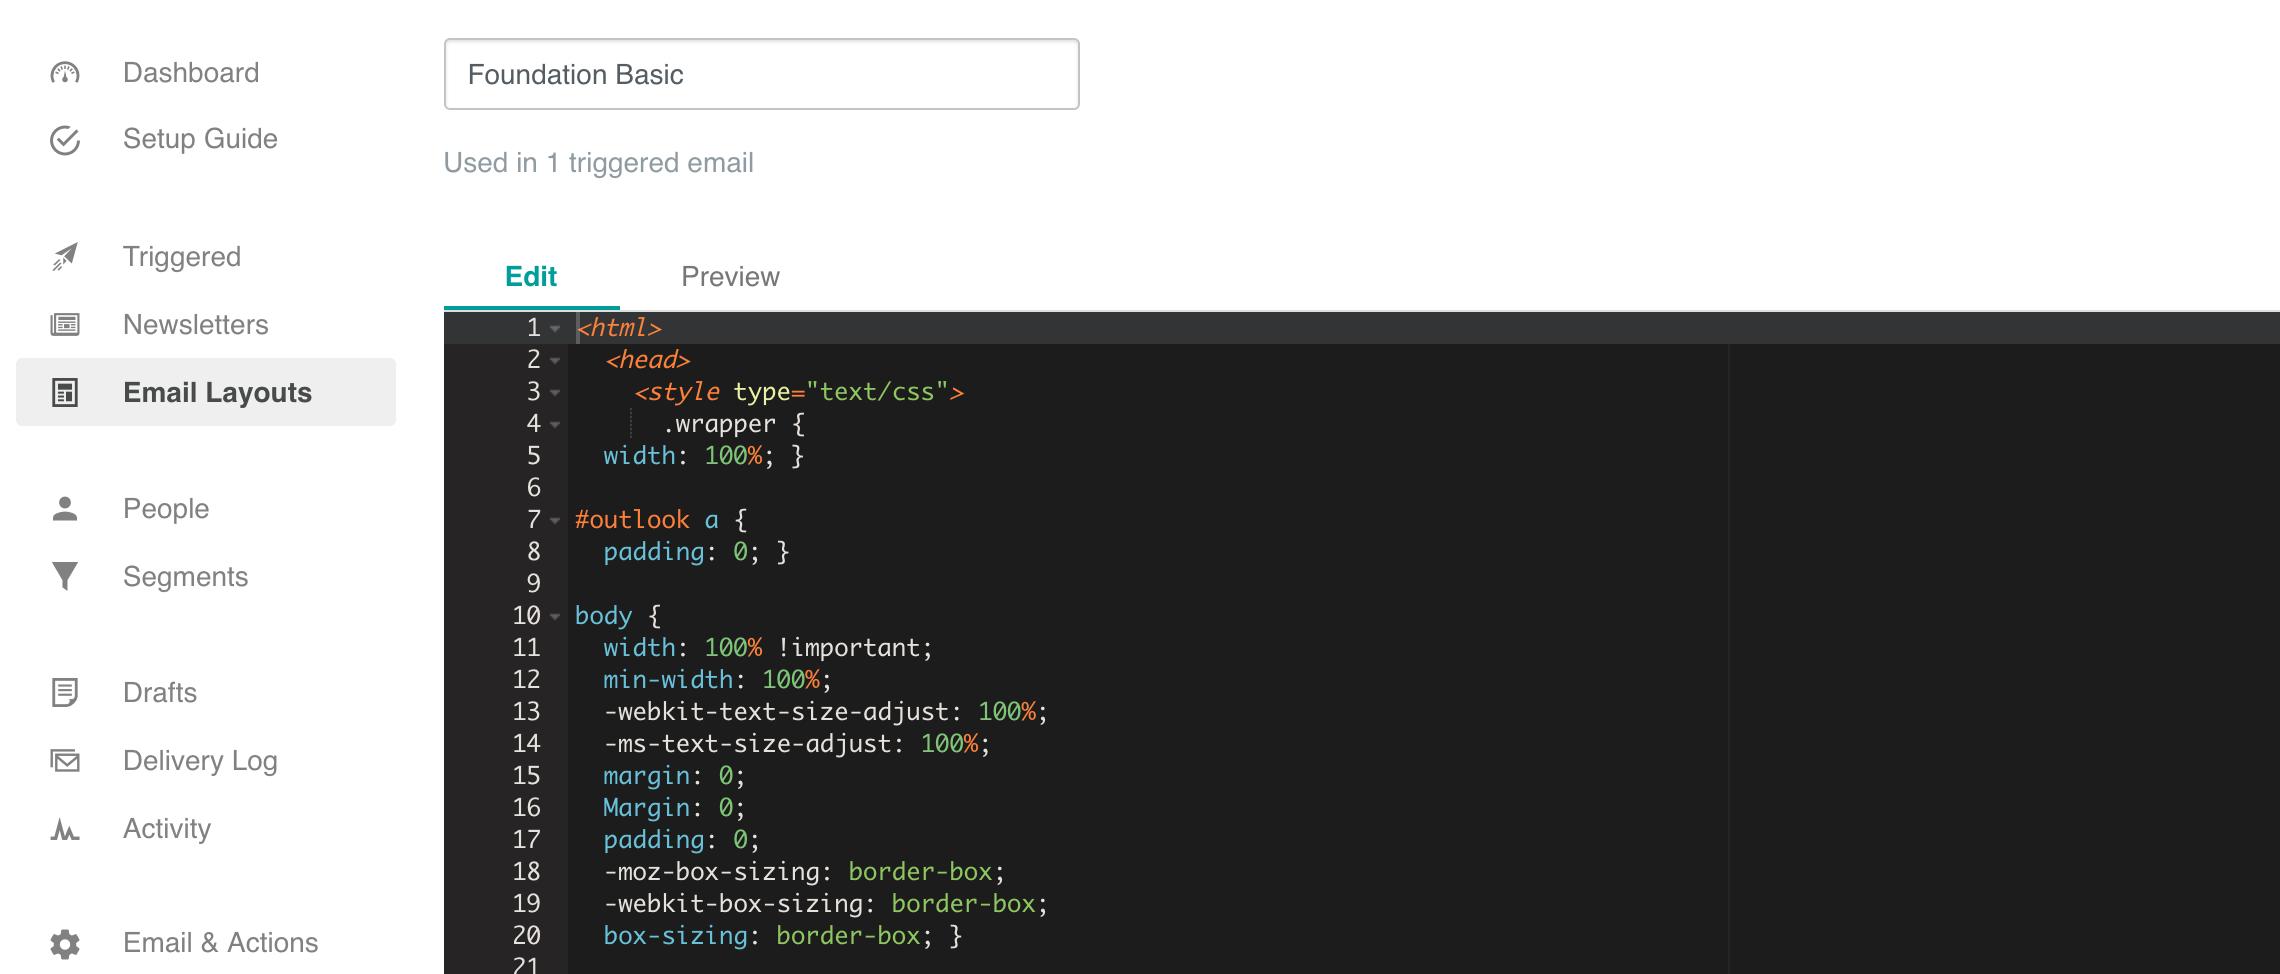 Adapting Foundation\'s Basic template | Customer.io